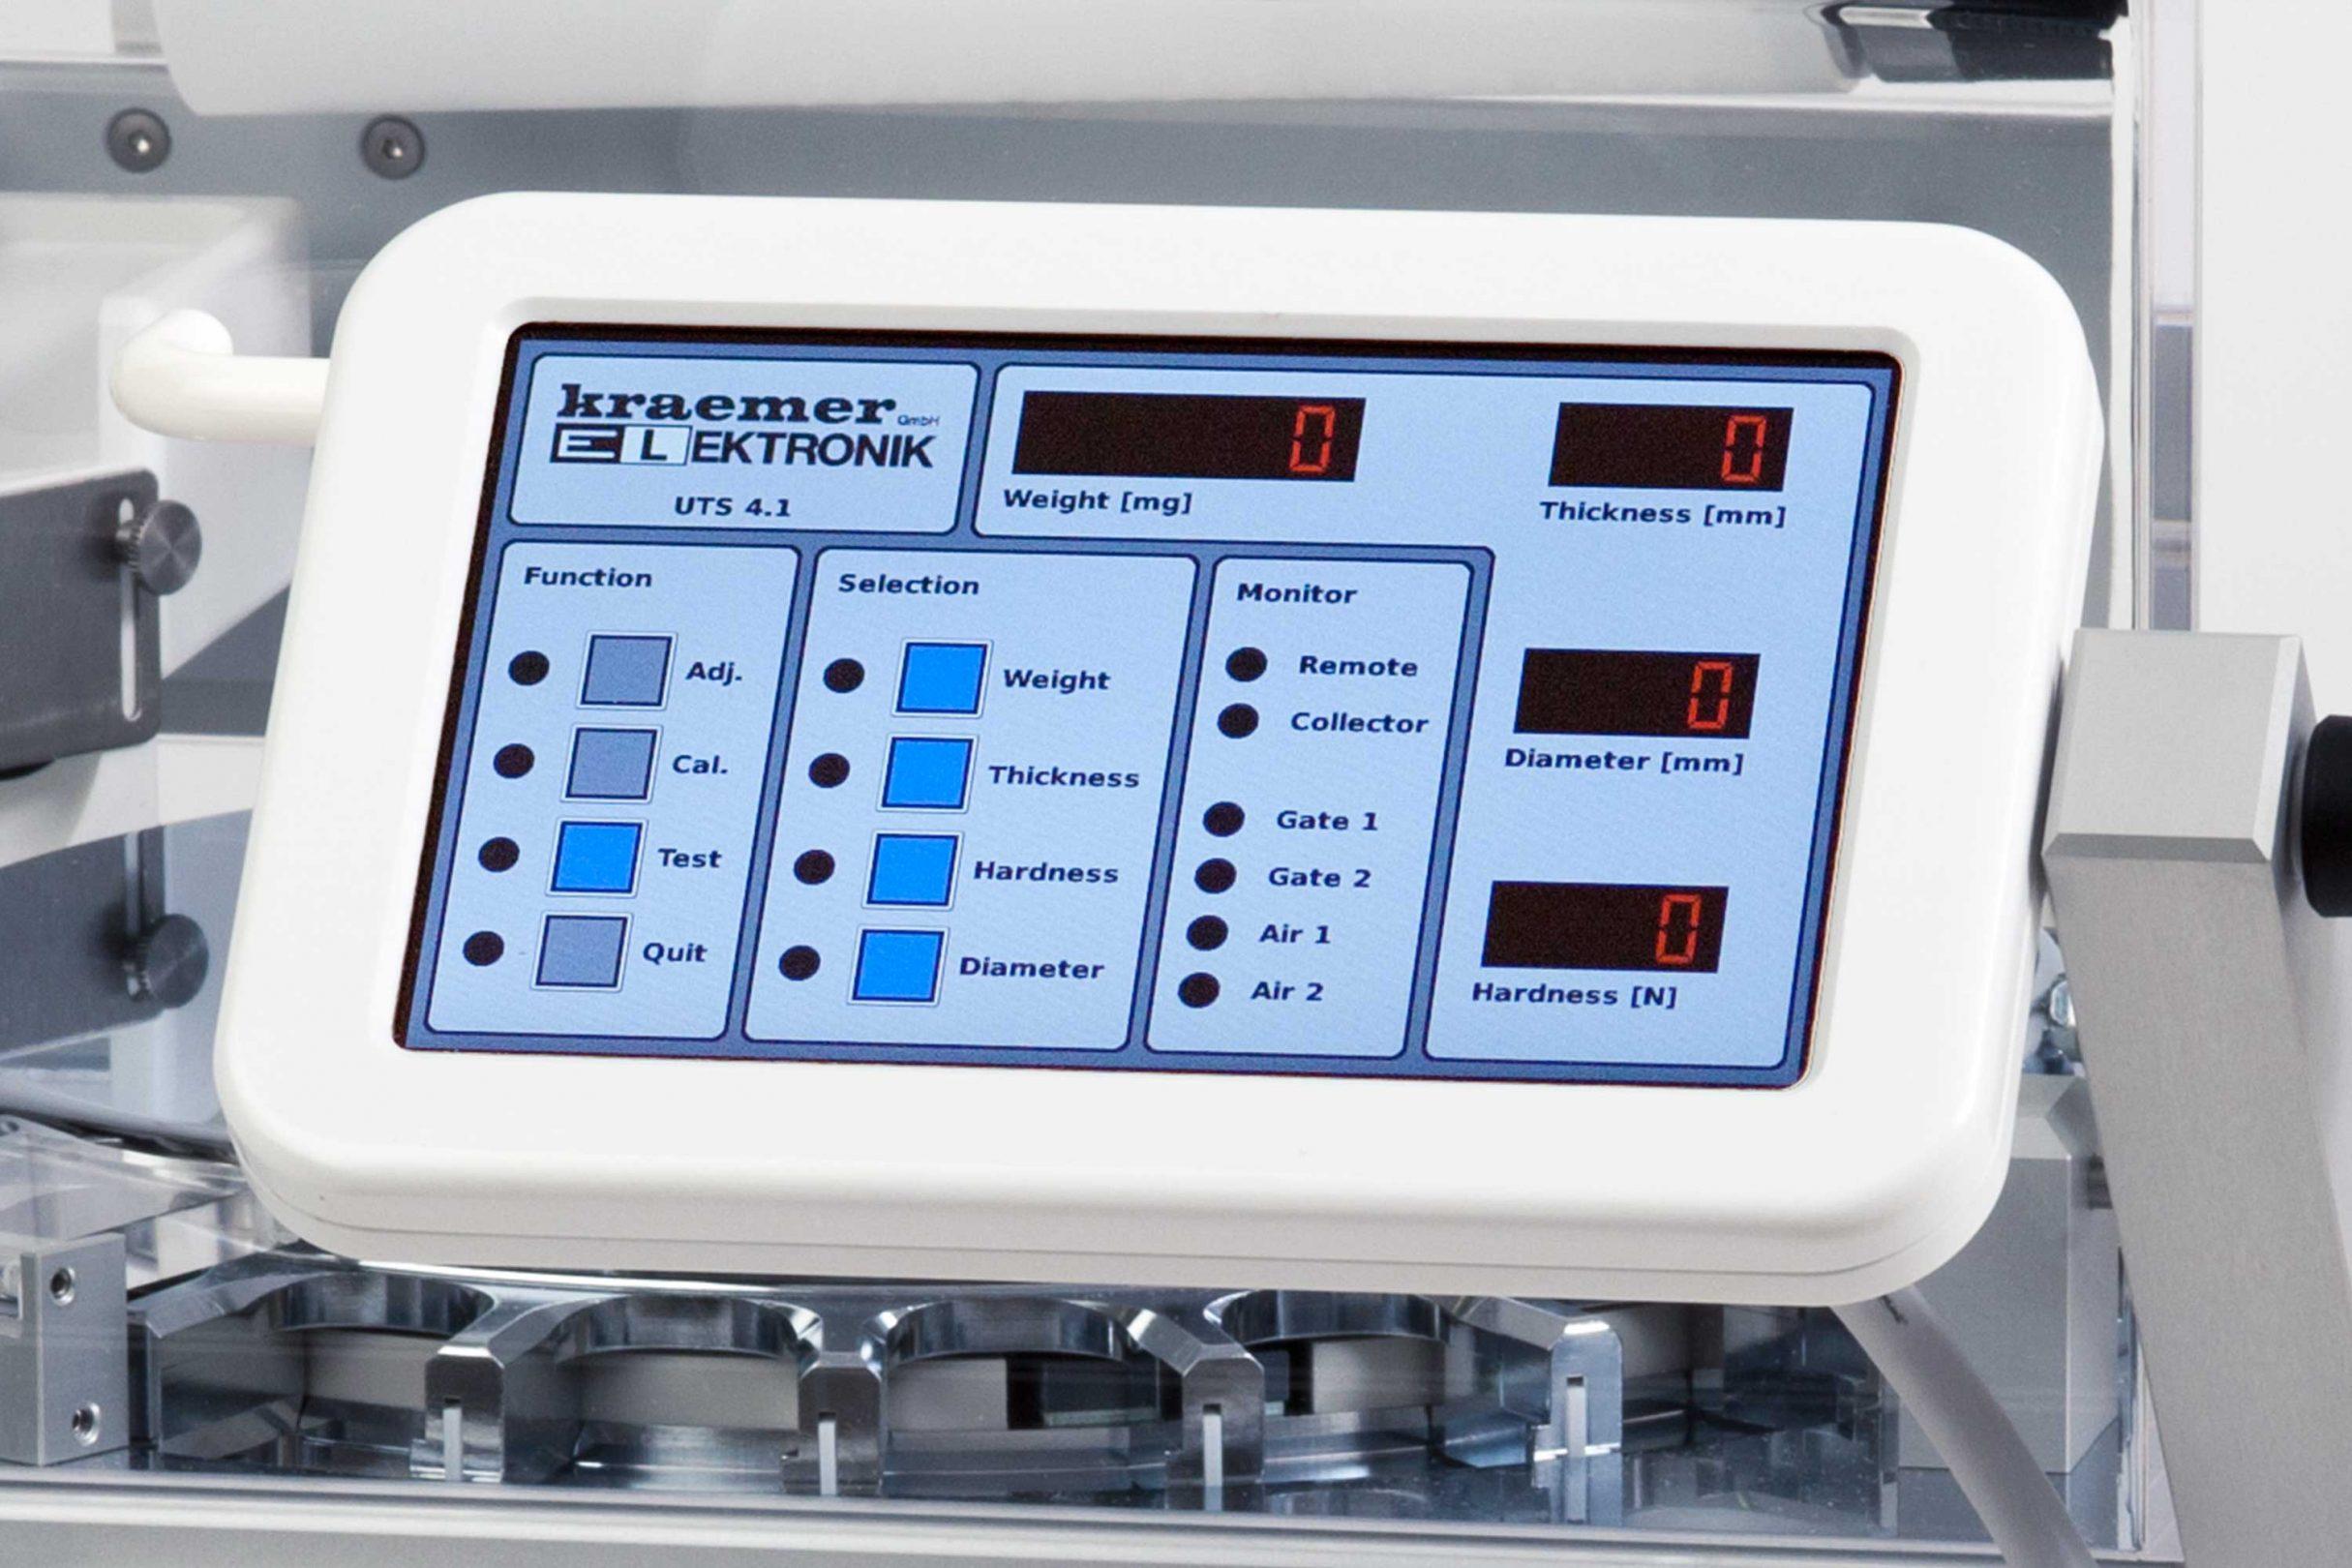 Touchscreen für Tablettenprüfsysteme, Kraemer Elektronik GmbH